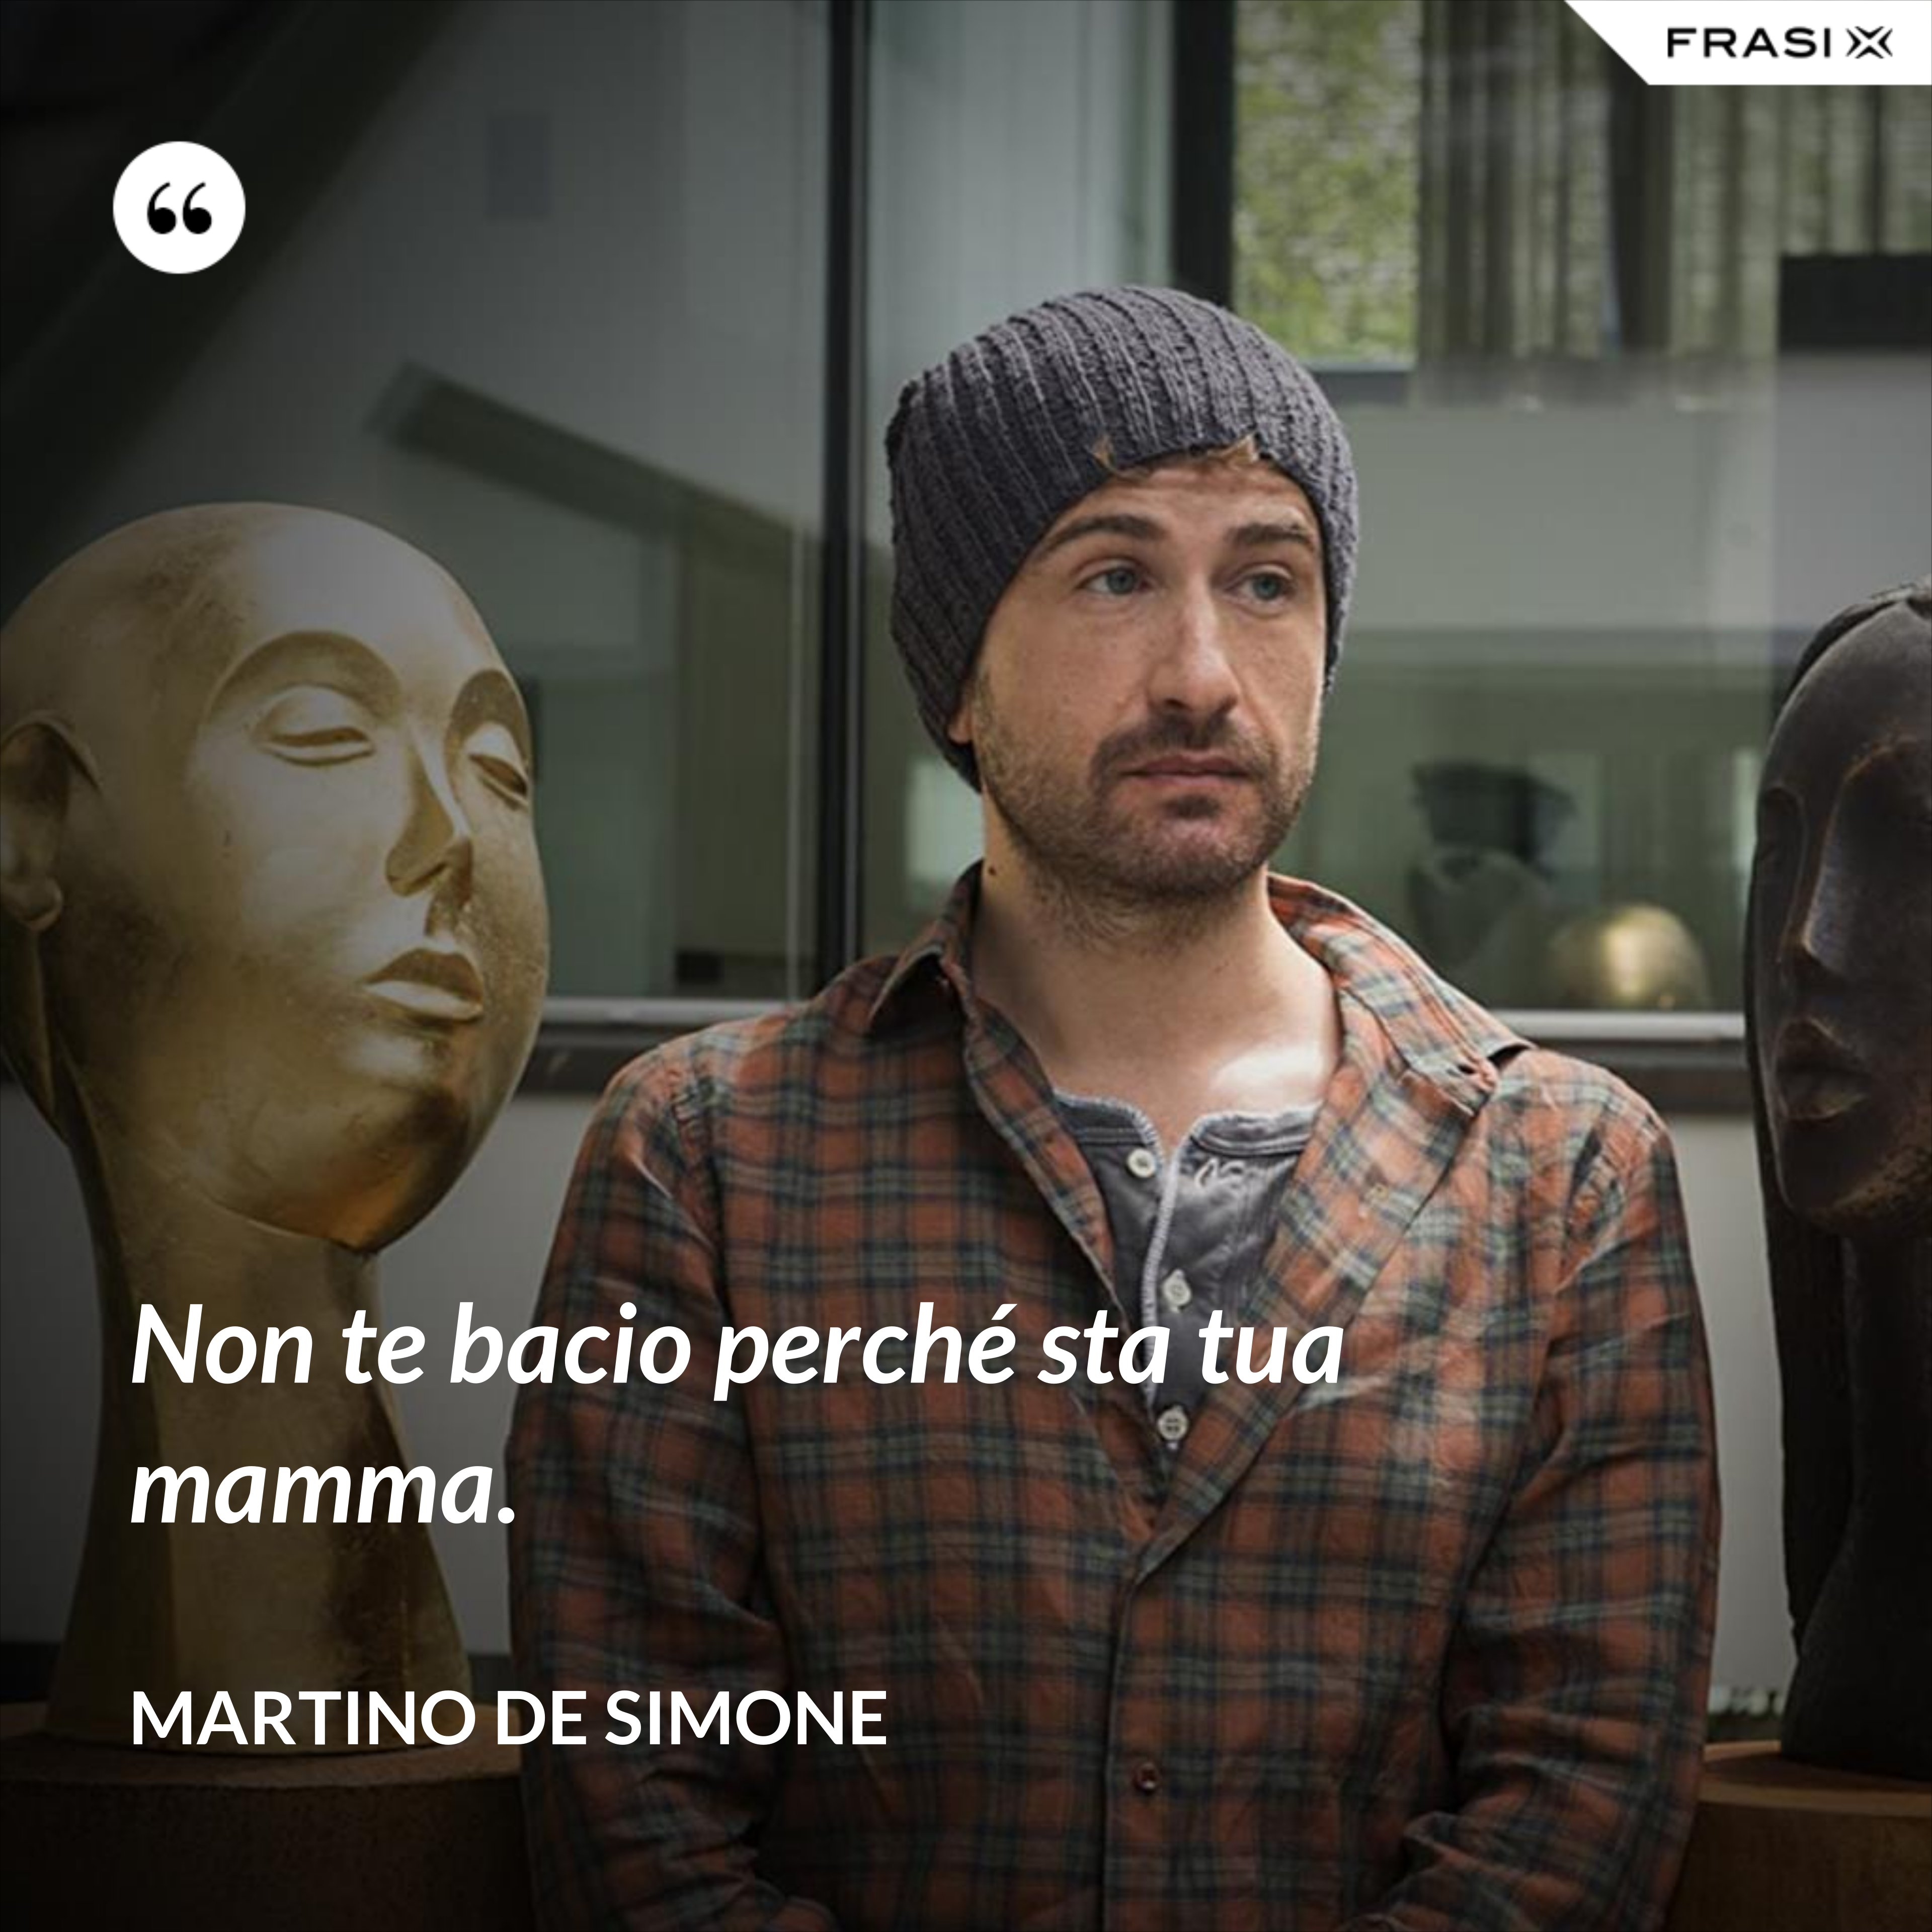 Non te bacio perché sta tua mamma. - Martino De Simone